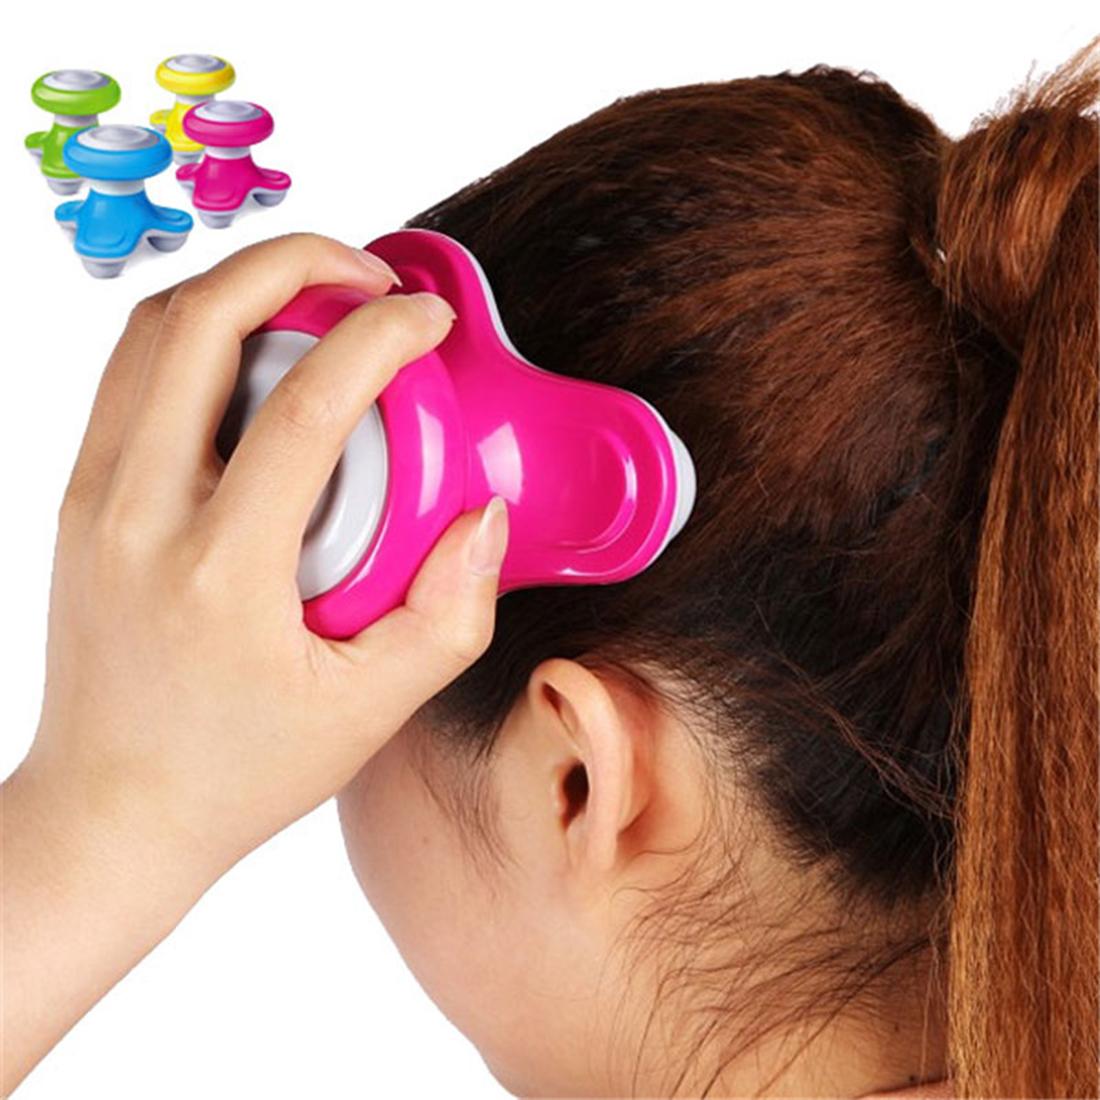 2016 Hot Mini USB Battery Full Body Massage Wave Vibrating Electric Handled Massager head massager Random Color(China (Mainland))